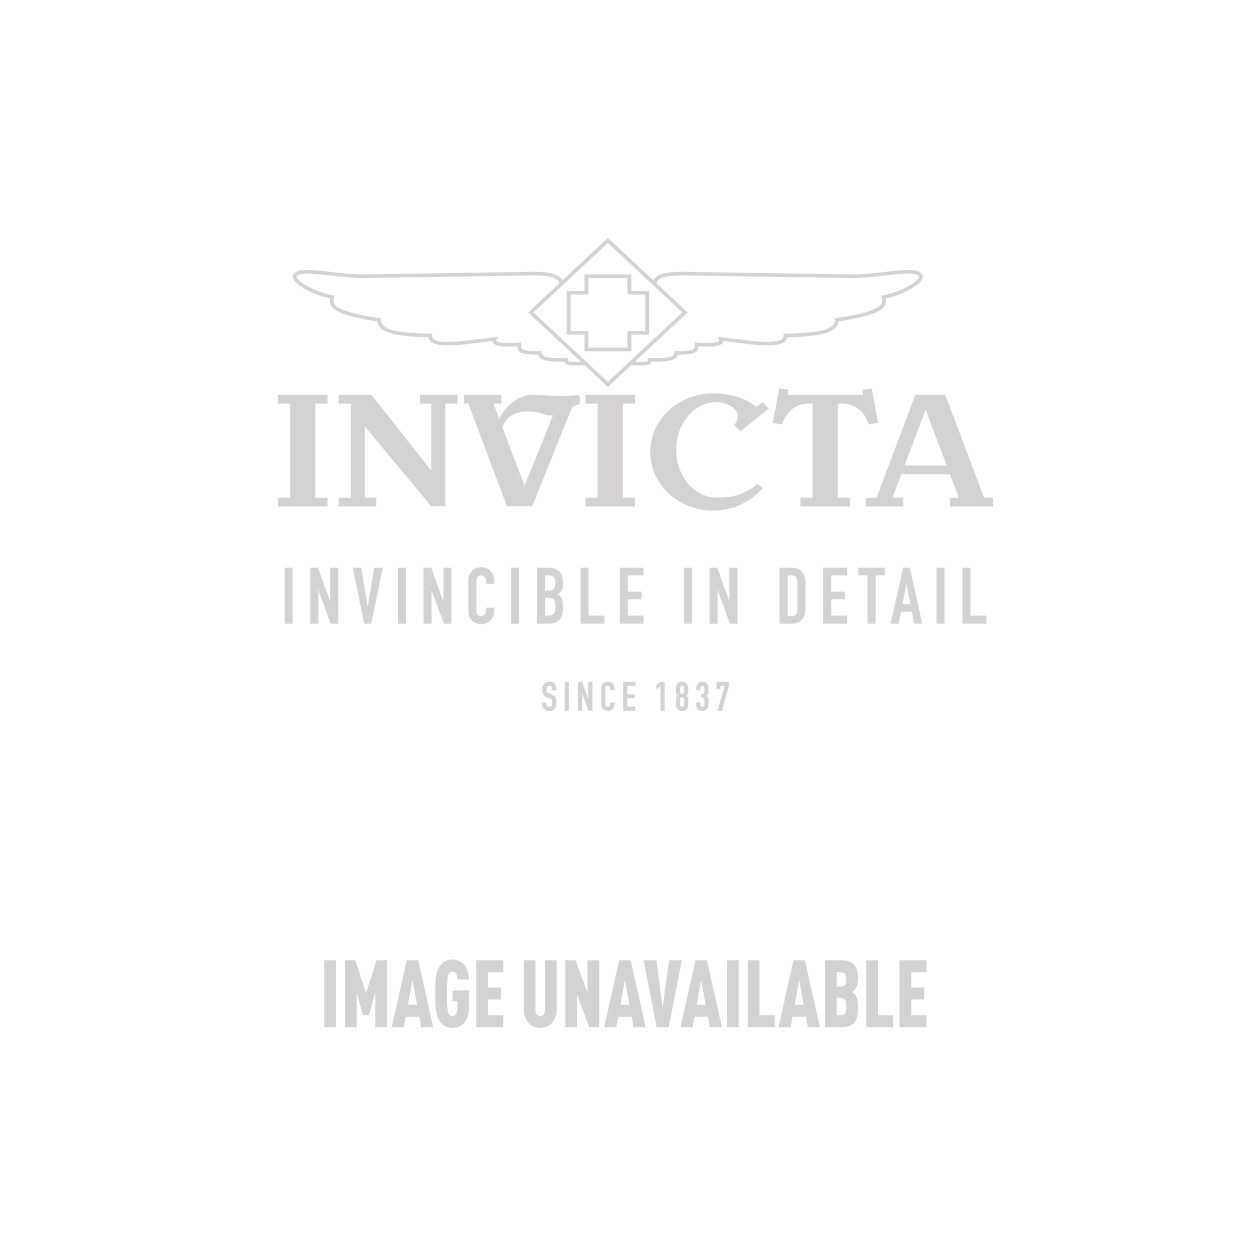 873fe40a7 Invicta S1 Rally watch in Black at InvictaStores.com